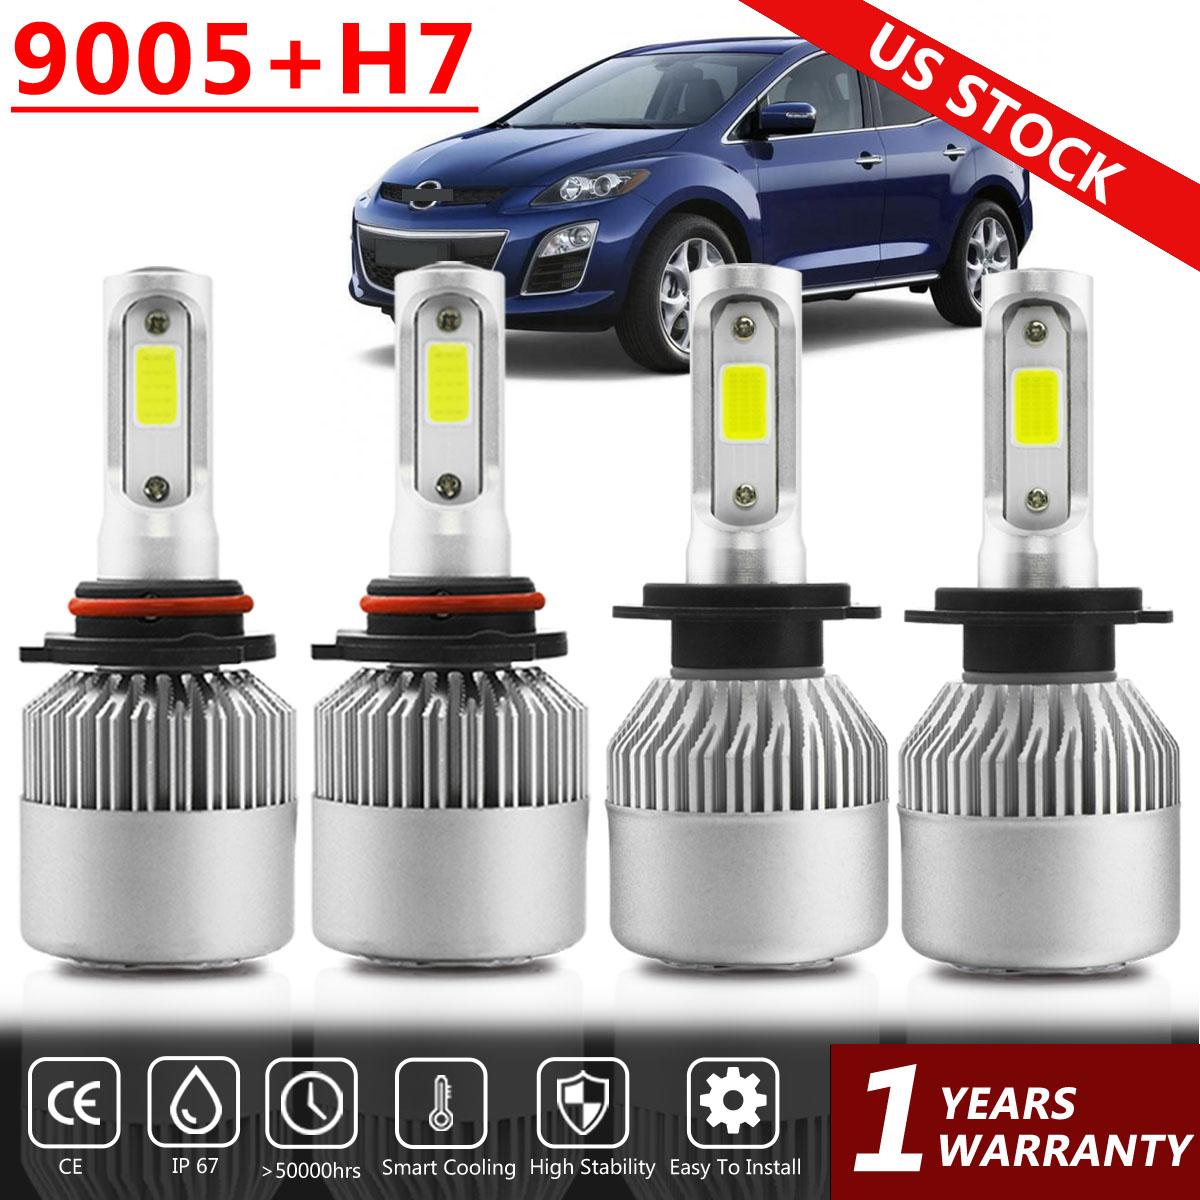 For Mazda CX-7 2007-2010 2011 2012 9005 H7 LED Headlight Combo White 4 Bulbs S2